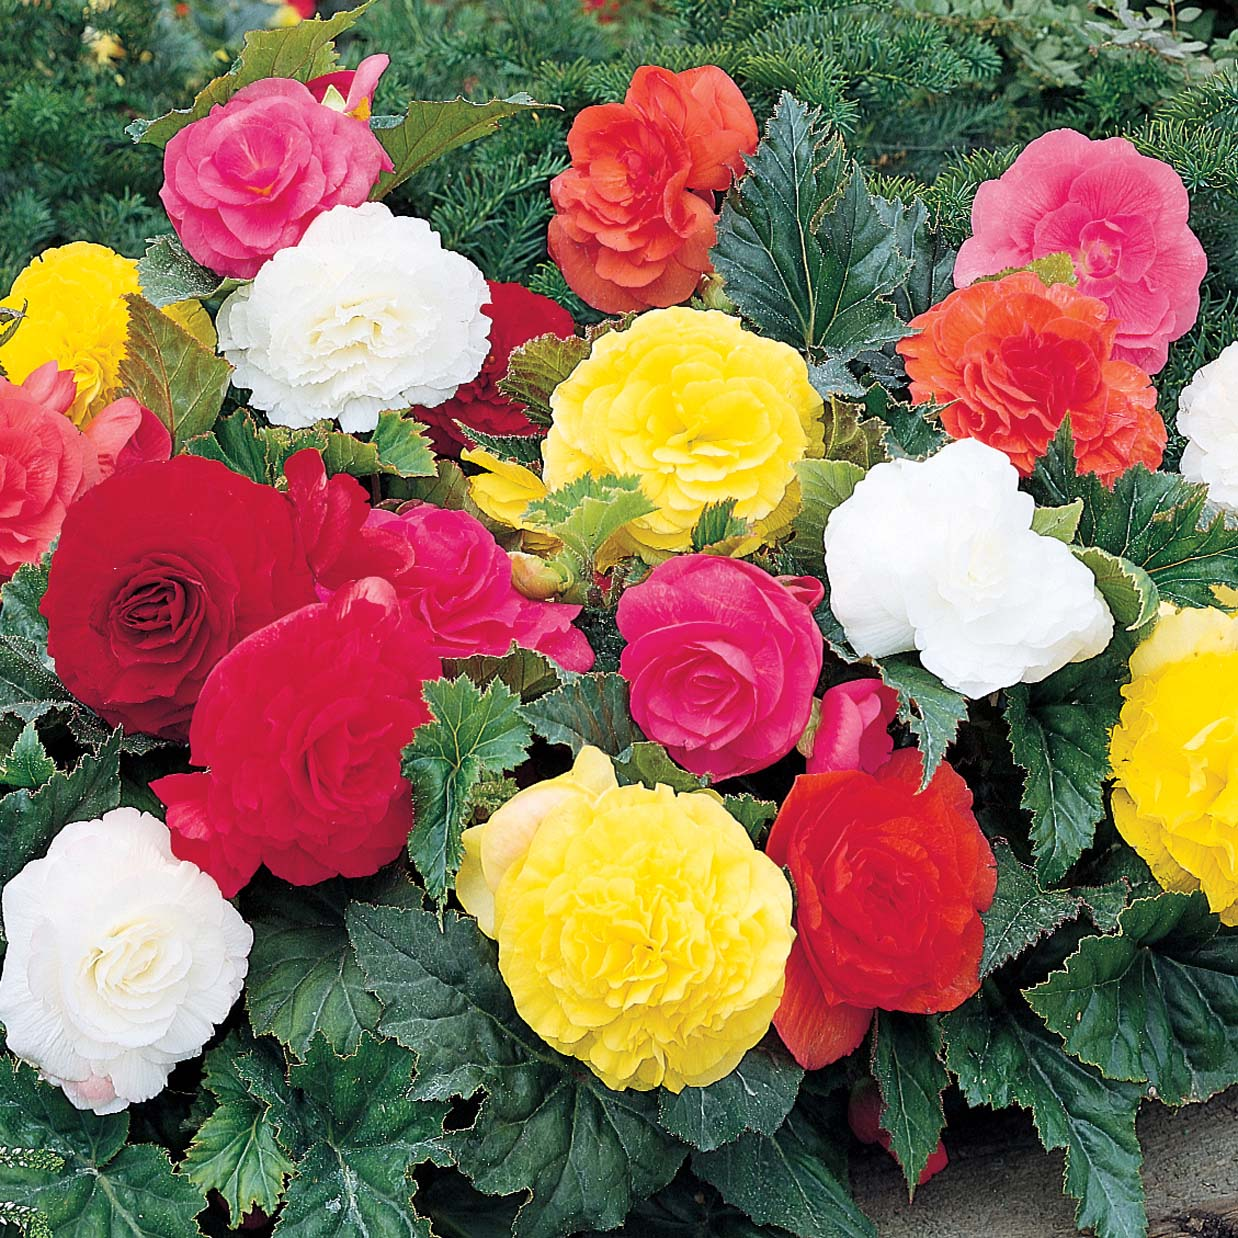 Himalayan Flower Nursery Begonia Bulbs